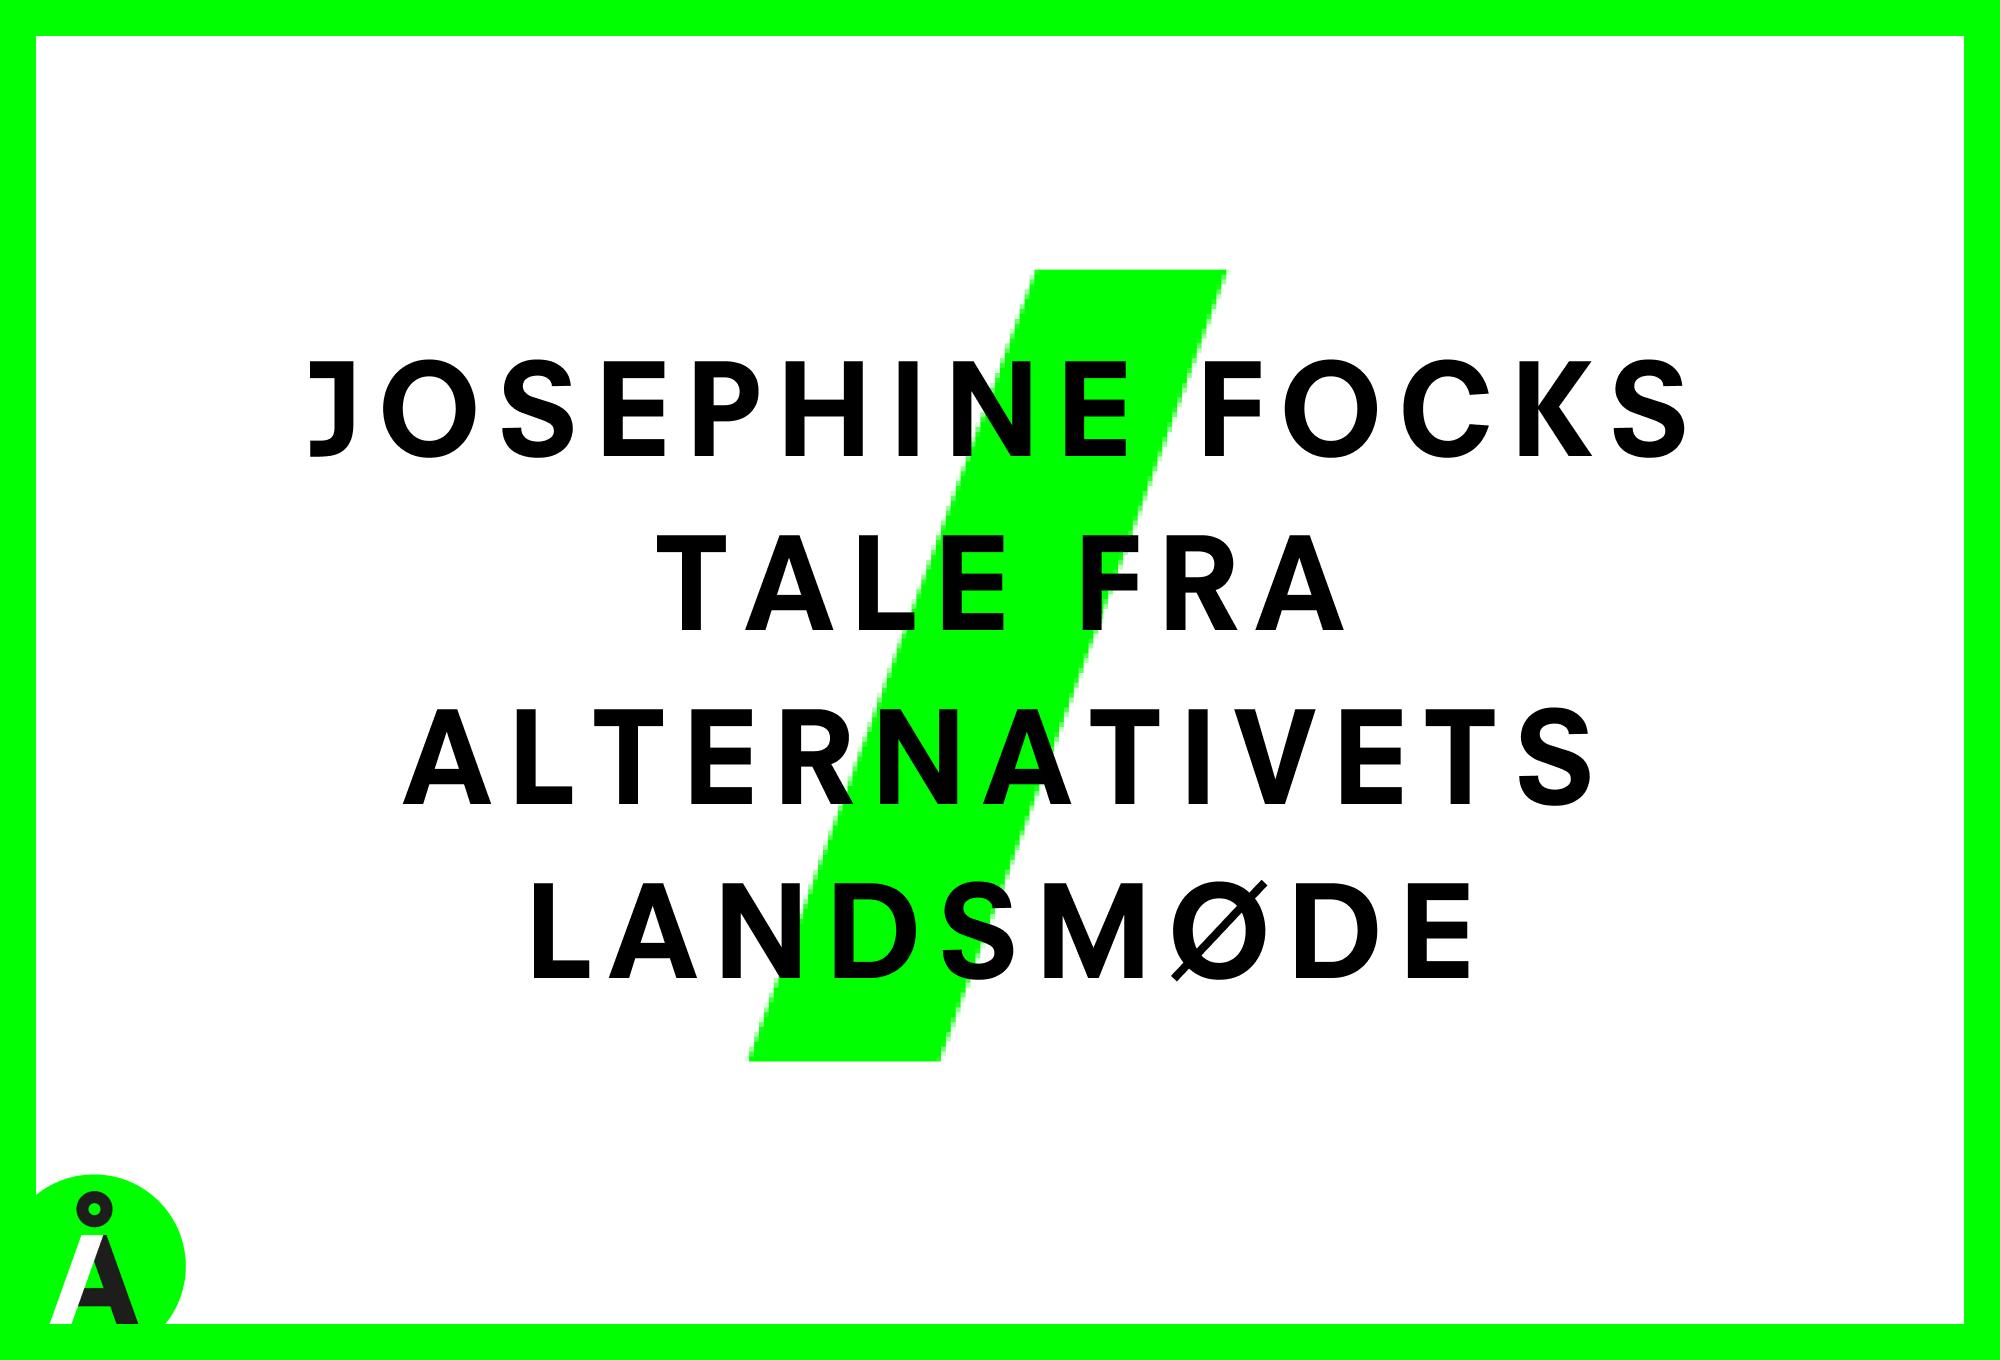 Josephine Focks Landsmødetale 2020